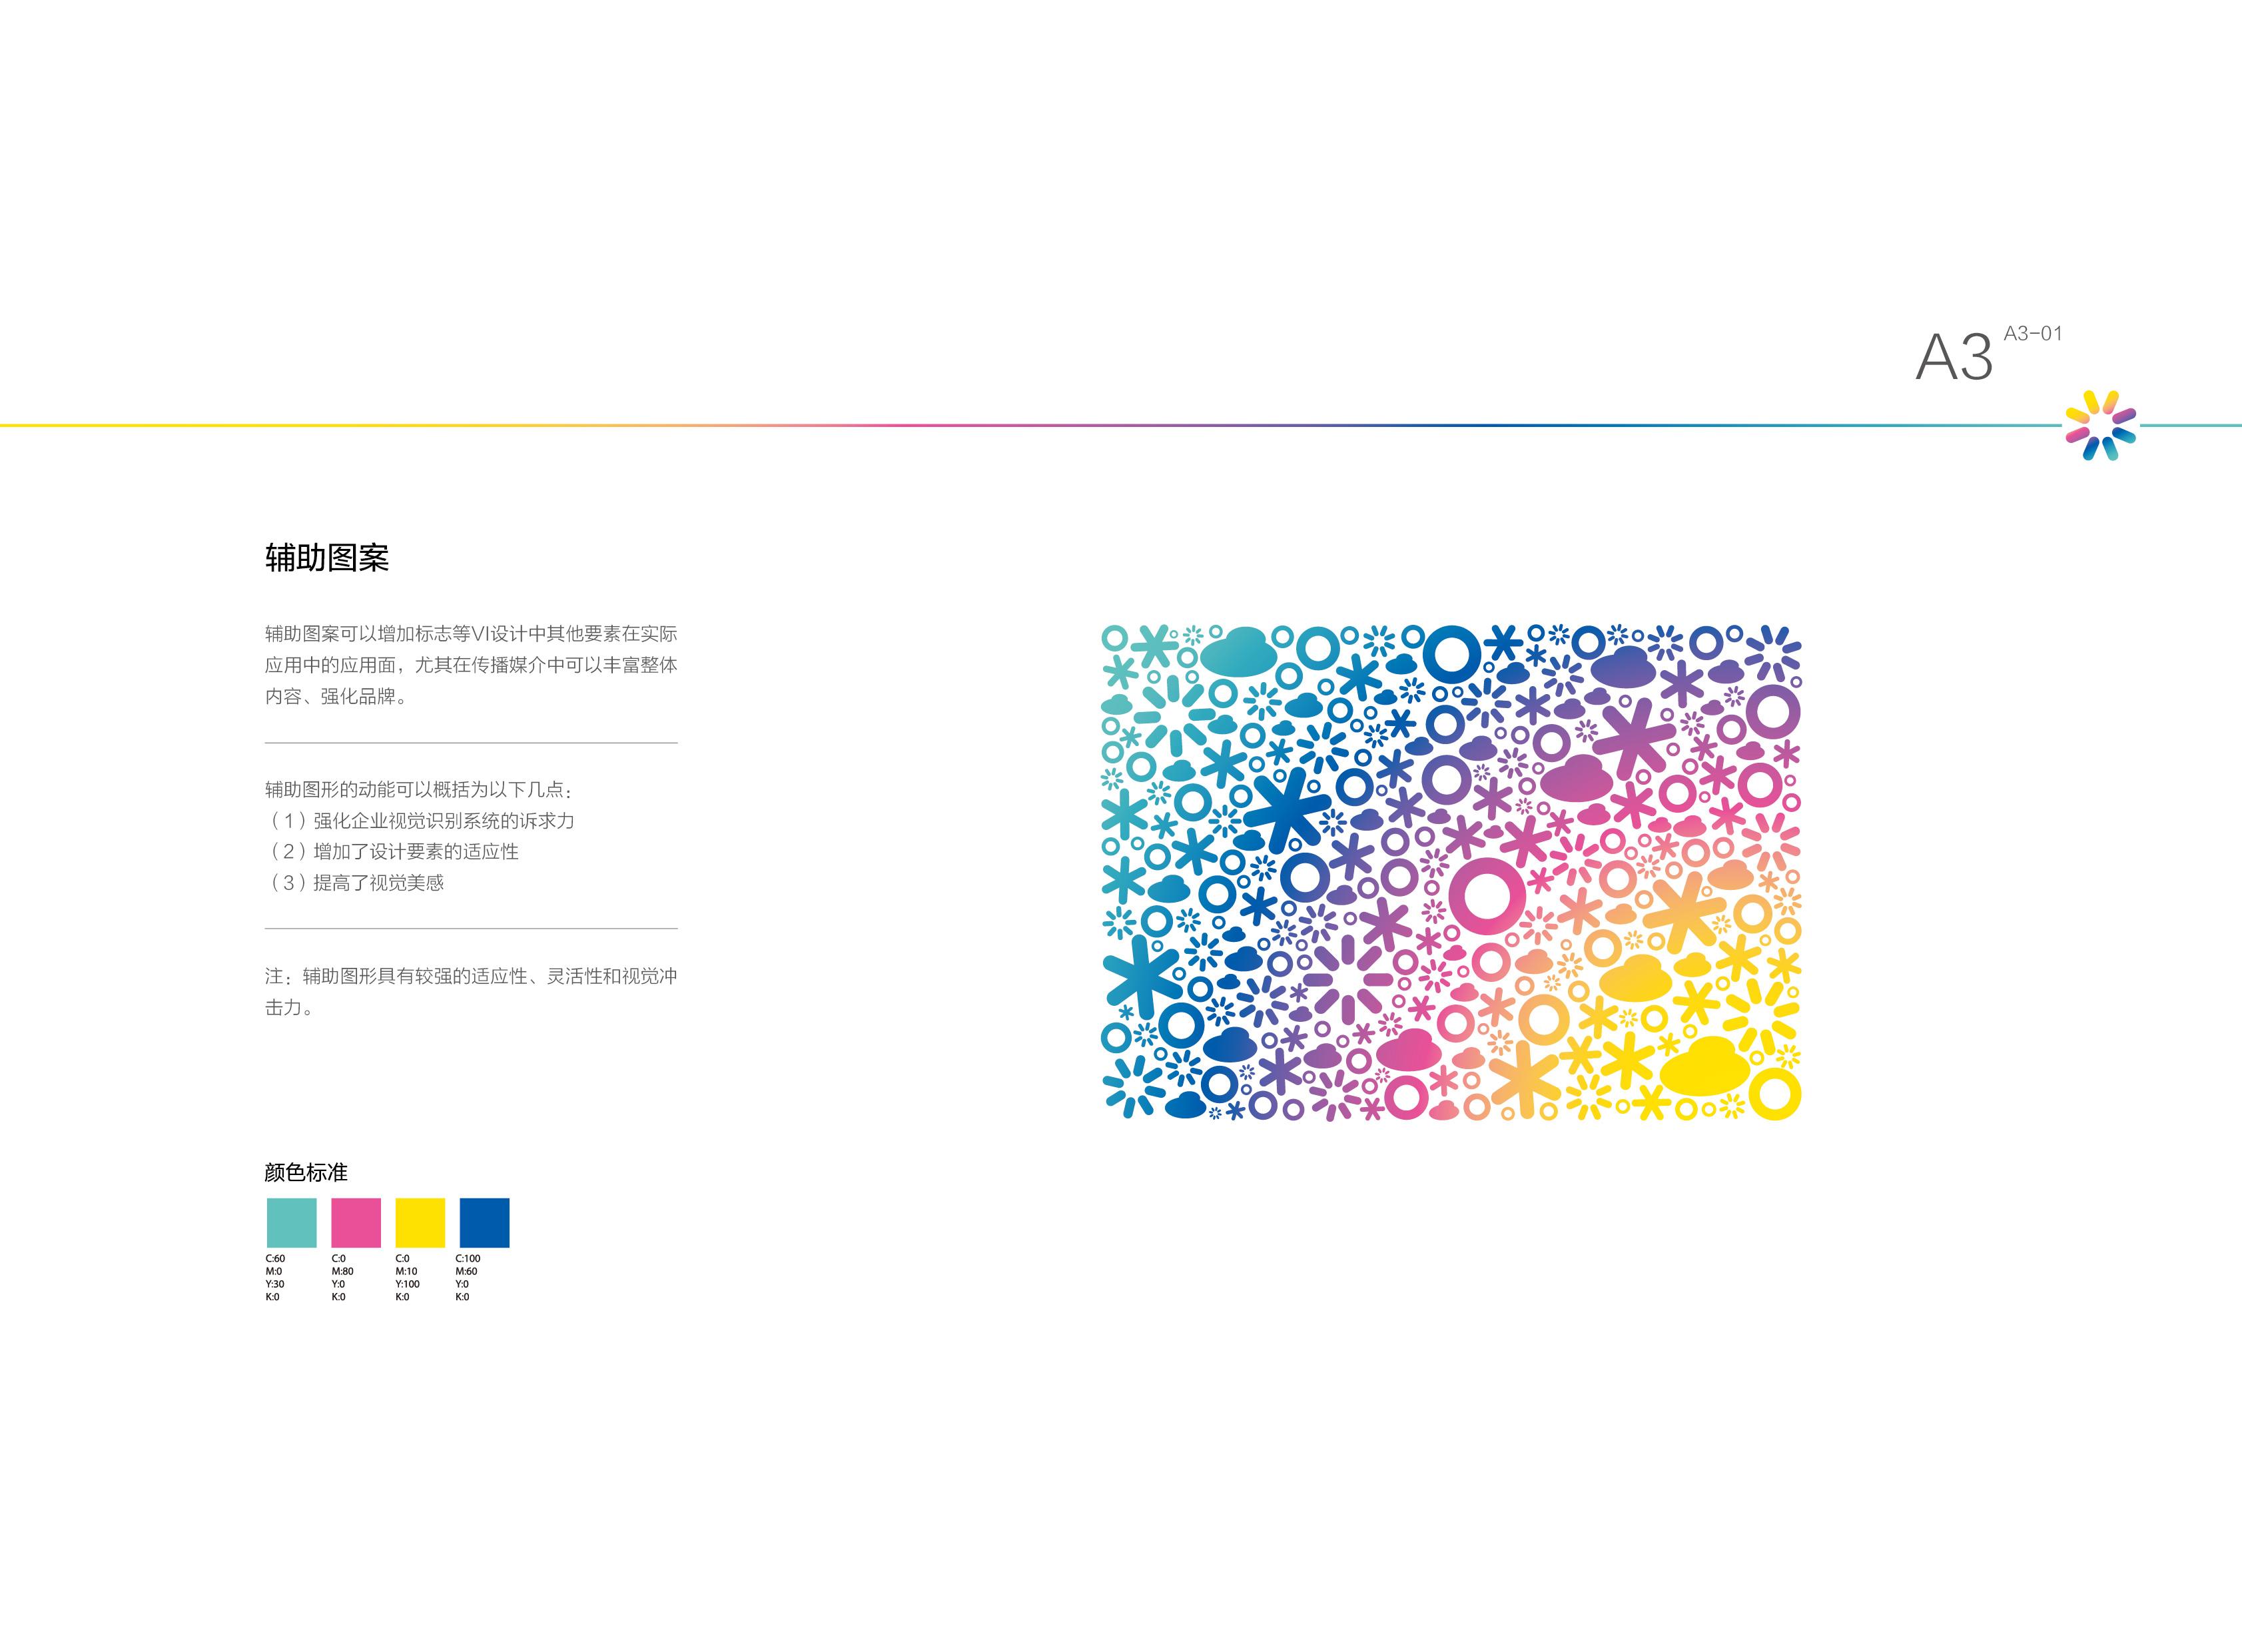 A3 辅助图形 (1).jpg